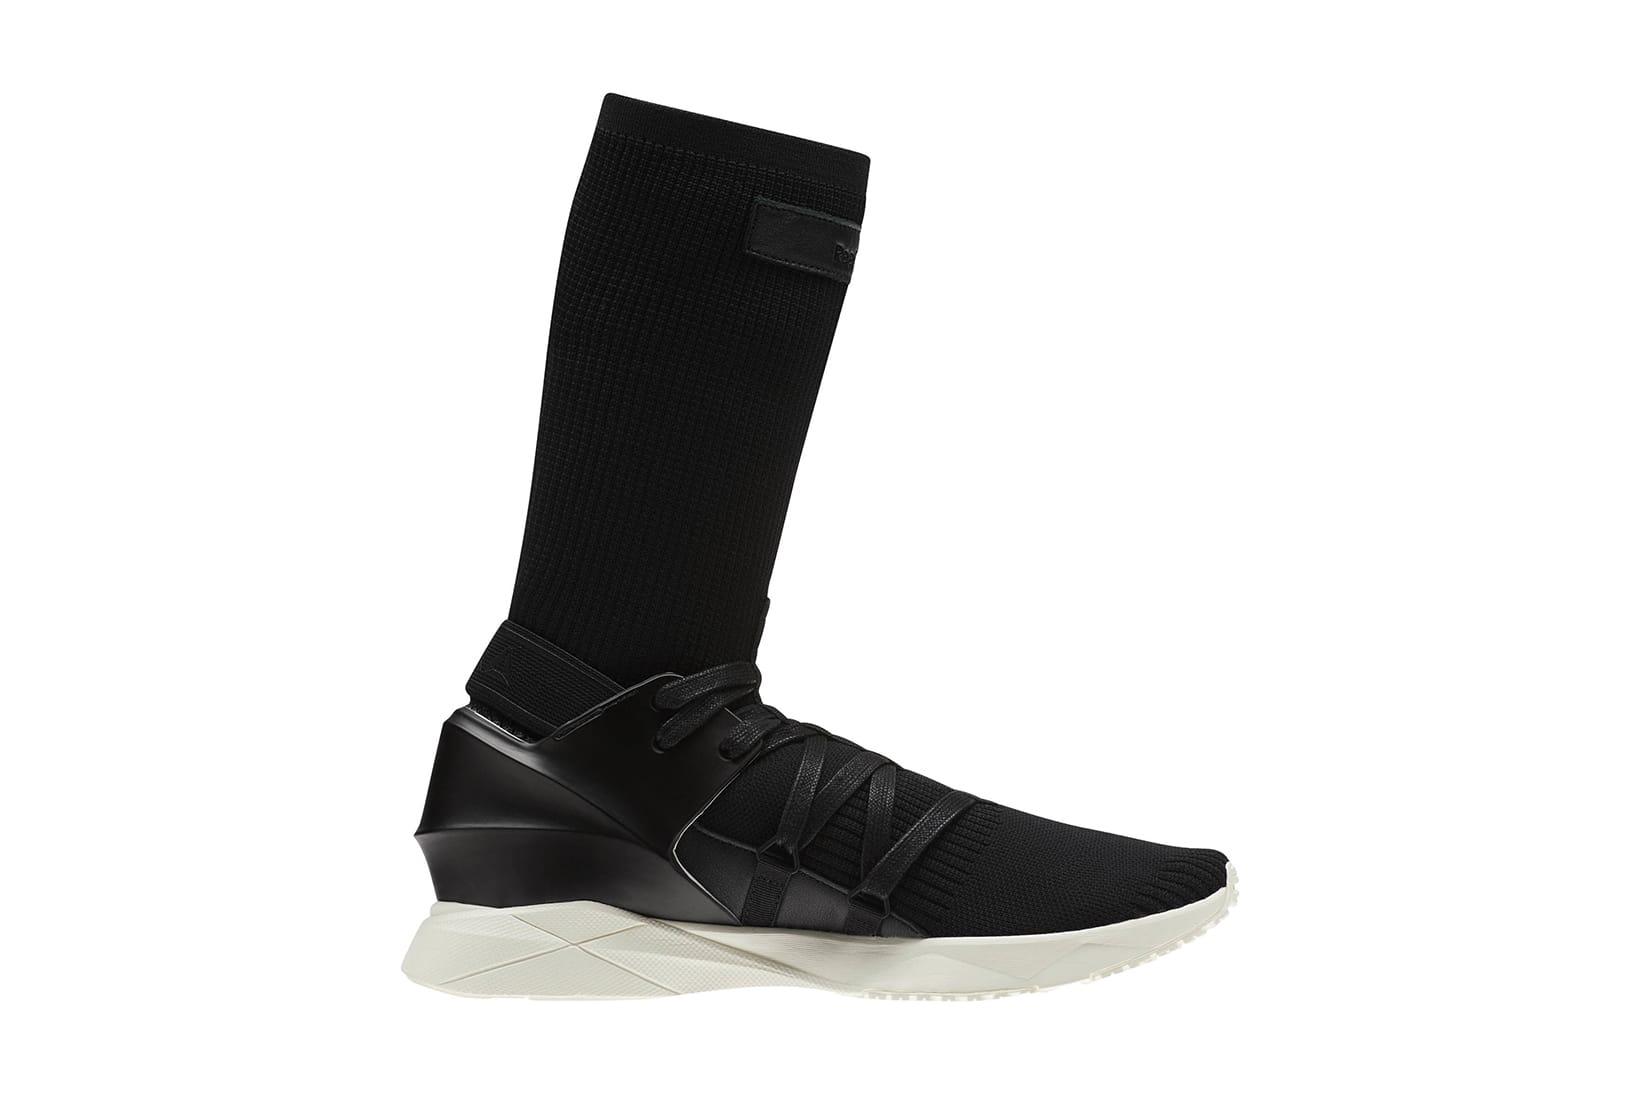 Reebok Sock Runner Caged in Black